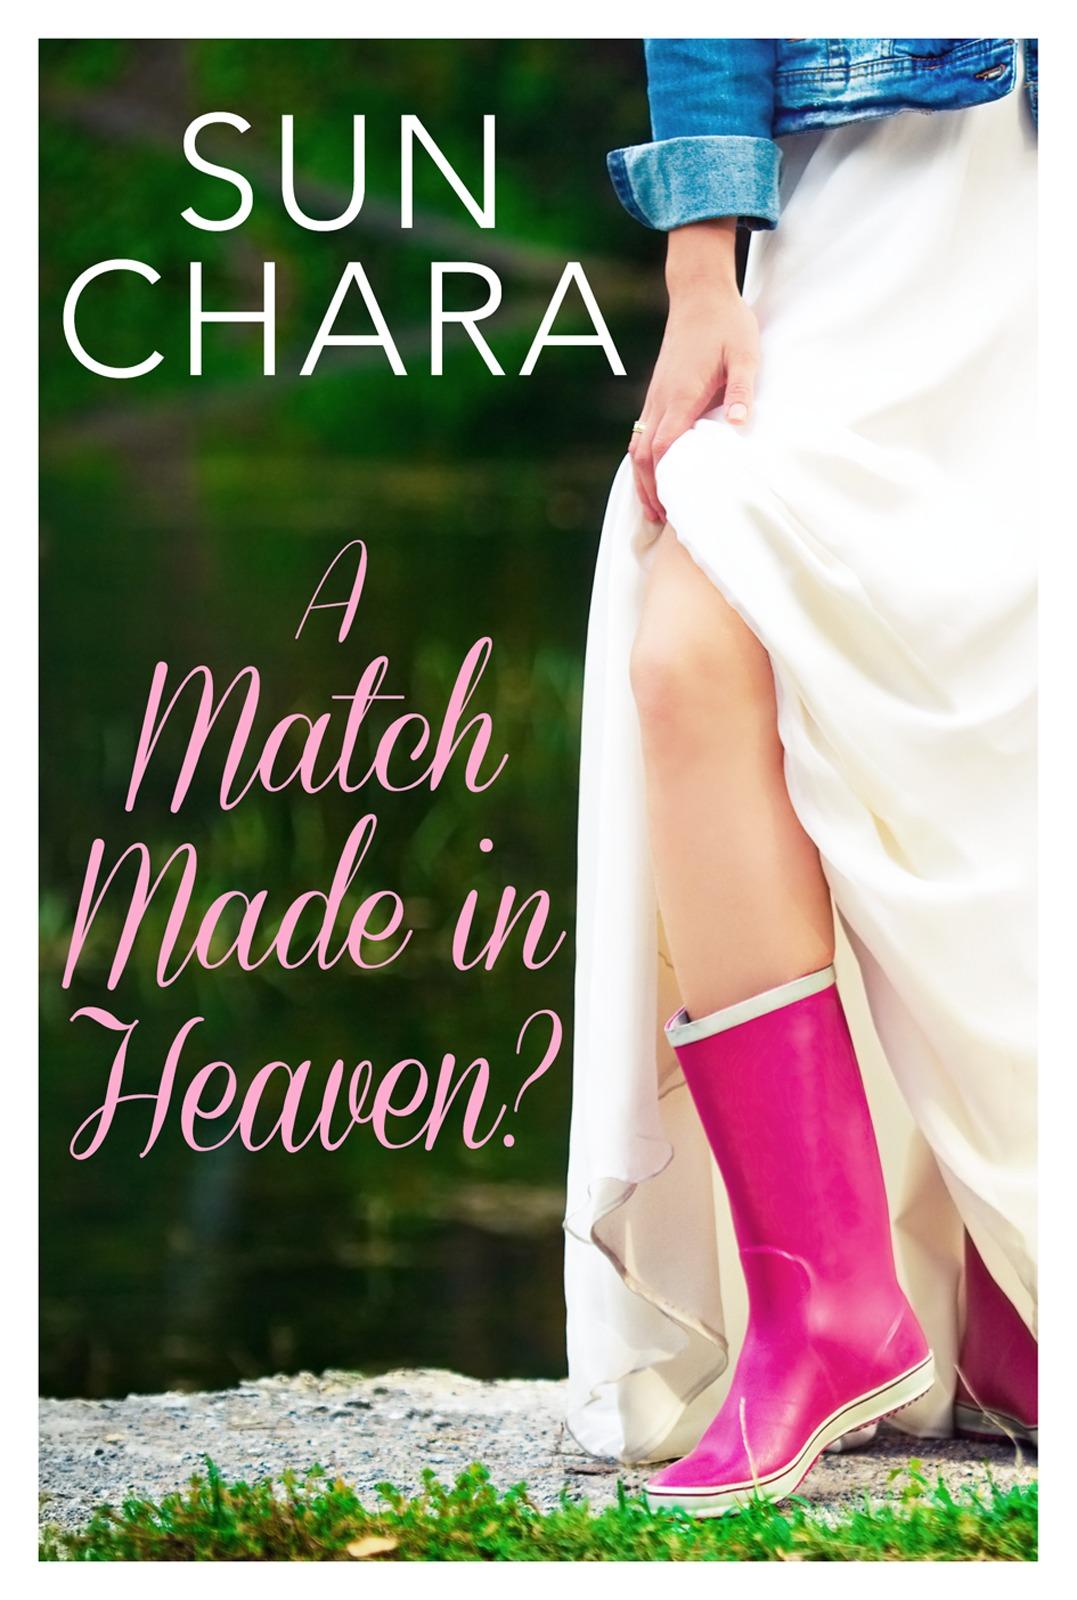 Sun Chara A Match Made in Heaven? ожерелья и кулоны handmade 2015 disfraces femininas shugo chara 0000